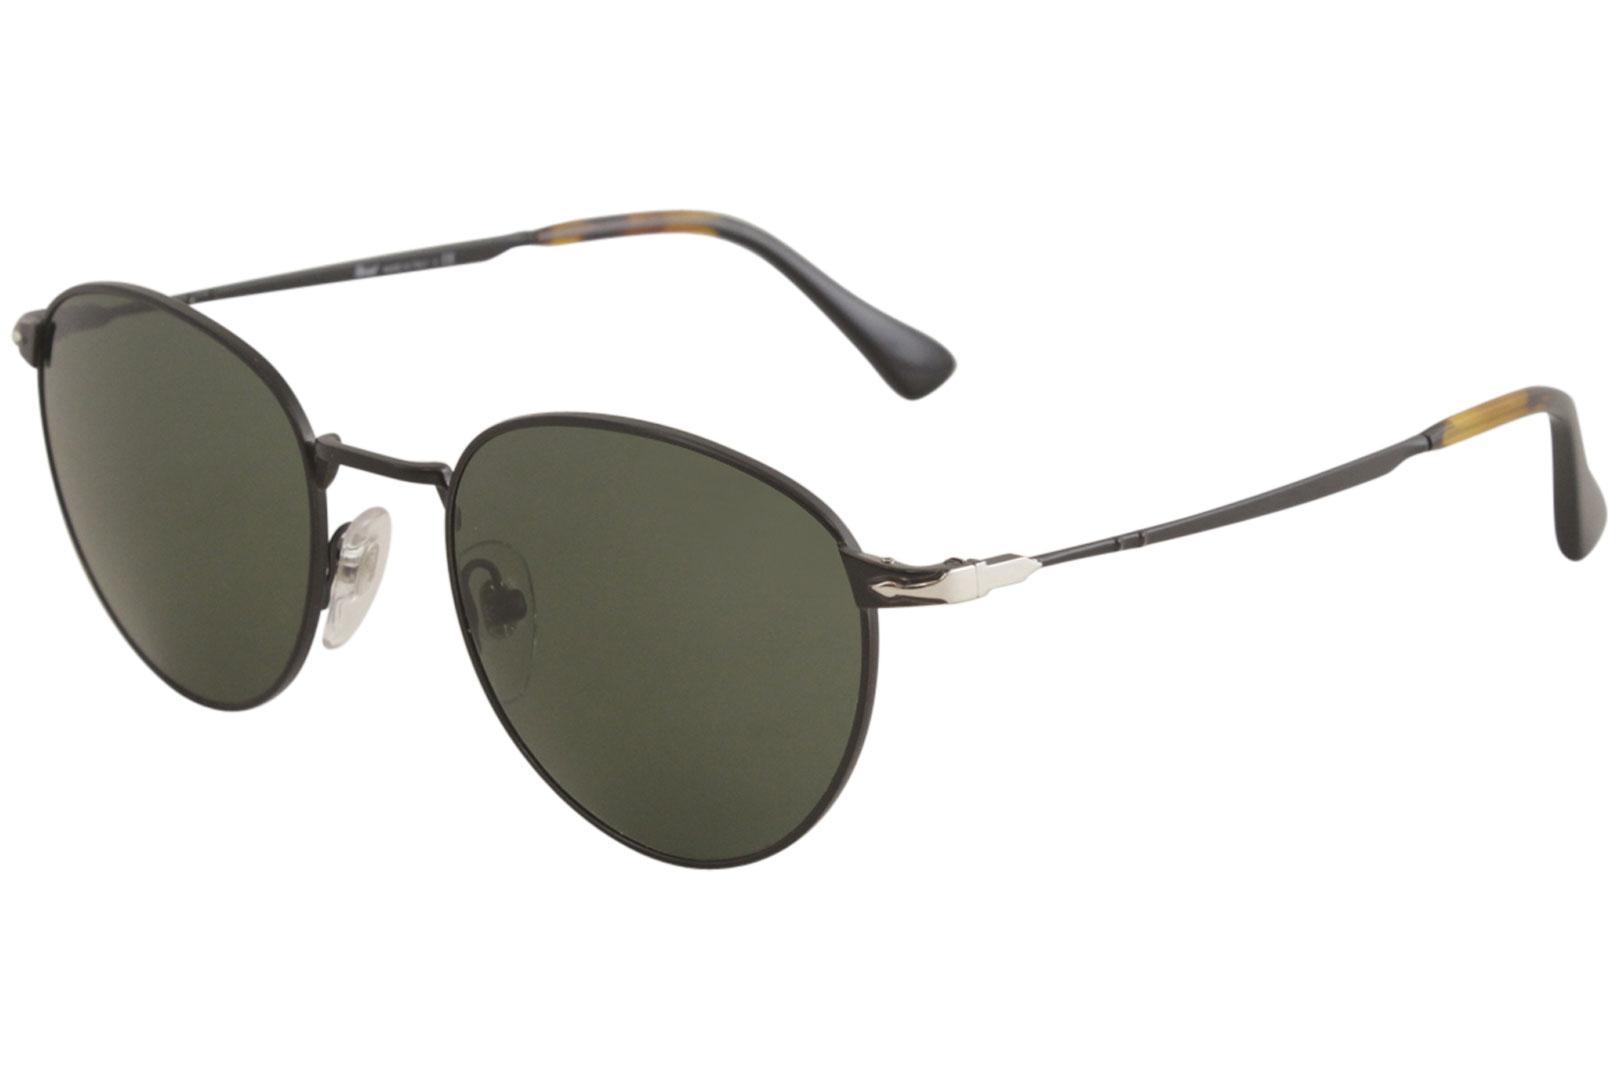 d10f3ff4e8 Persol Men s PO2445S PO 2445 S Fashion Round Sunglasses